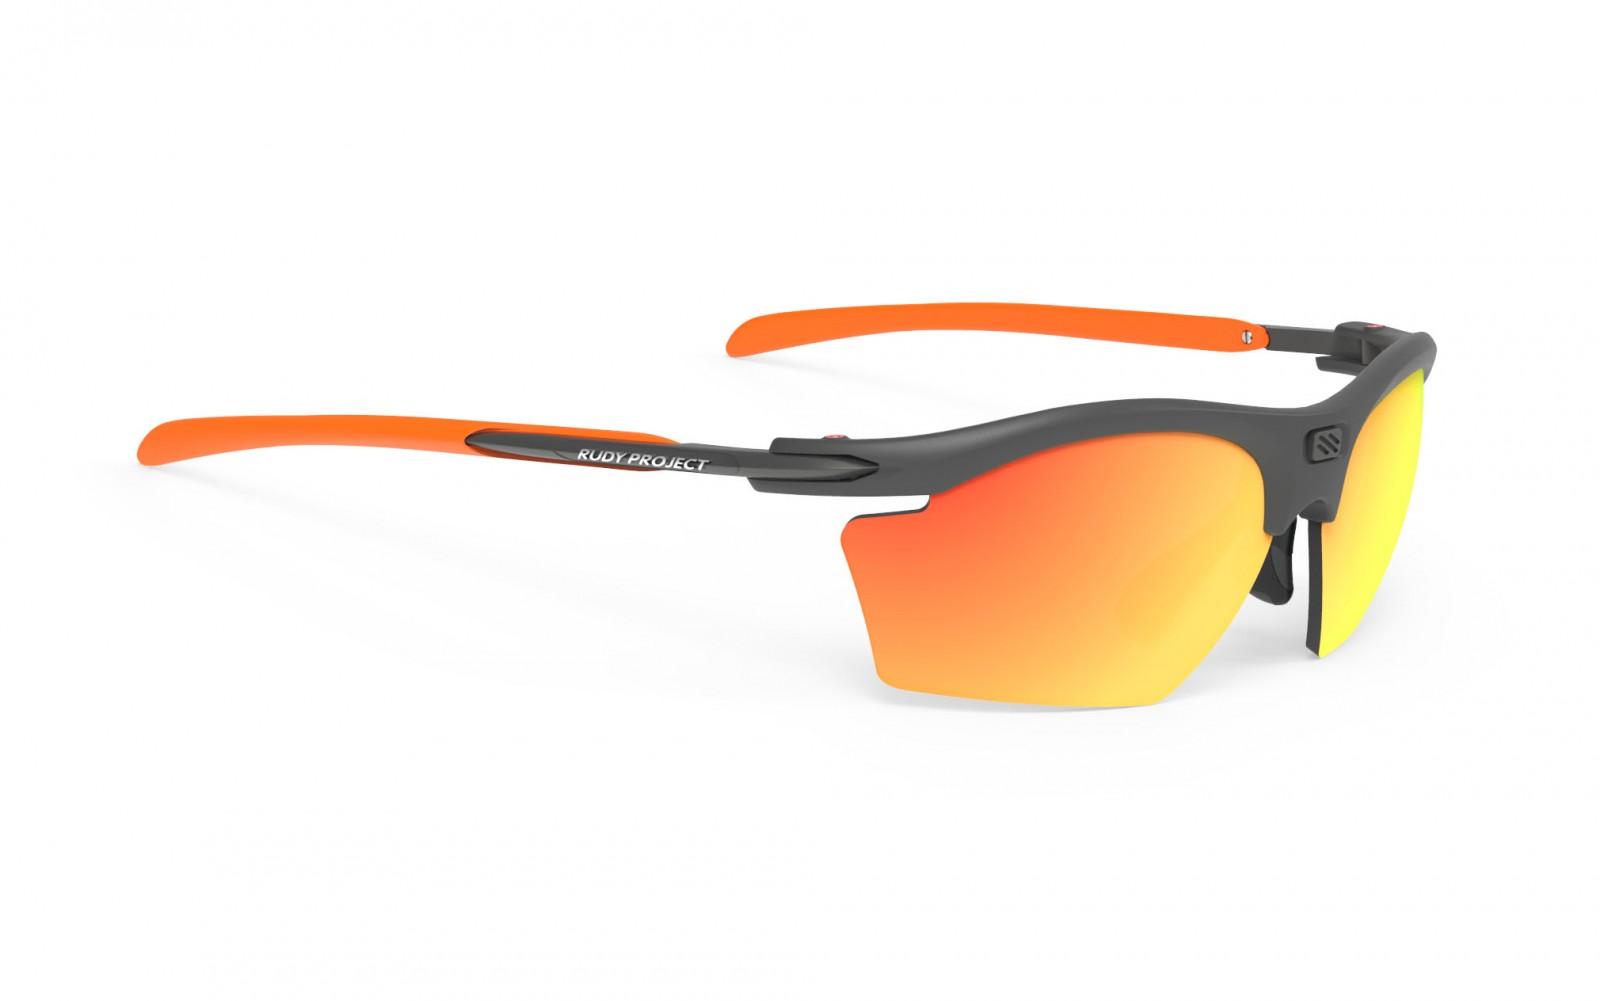 RYDON SLIM Graphite / Polar 3FX HDR Multilaser Orange